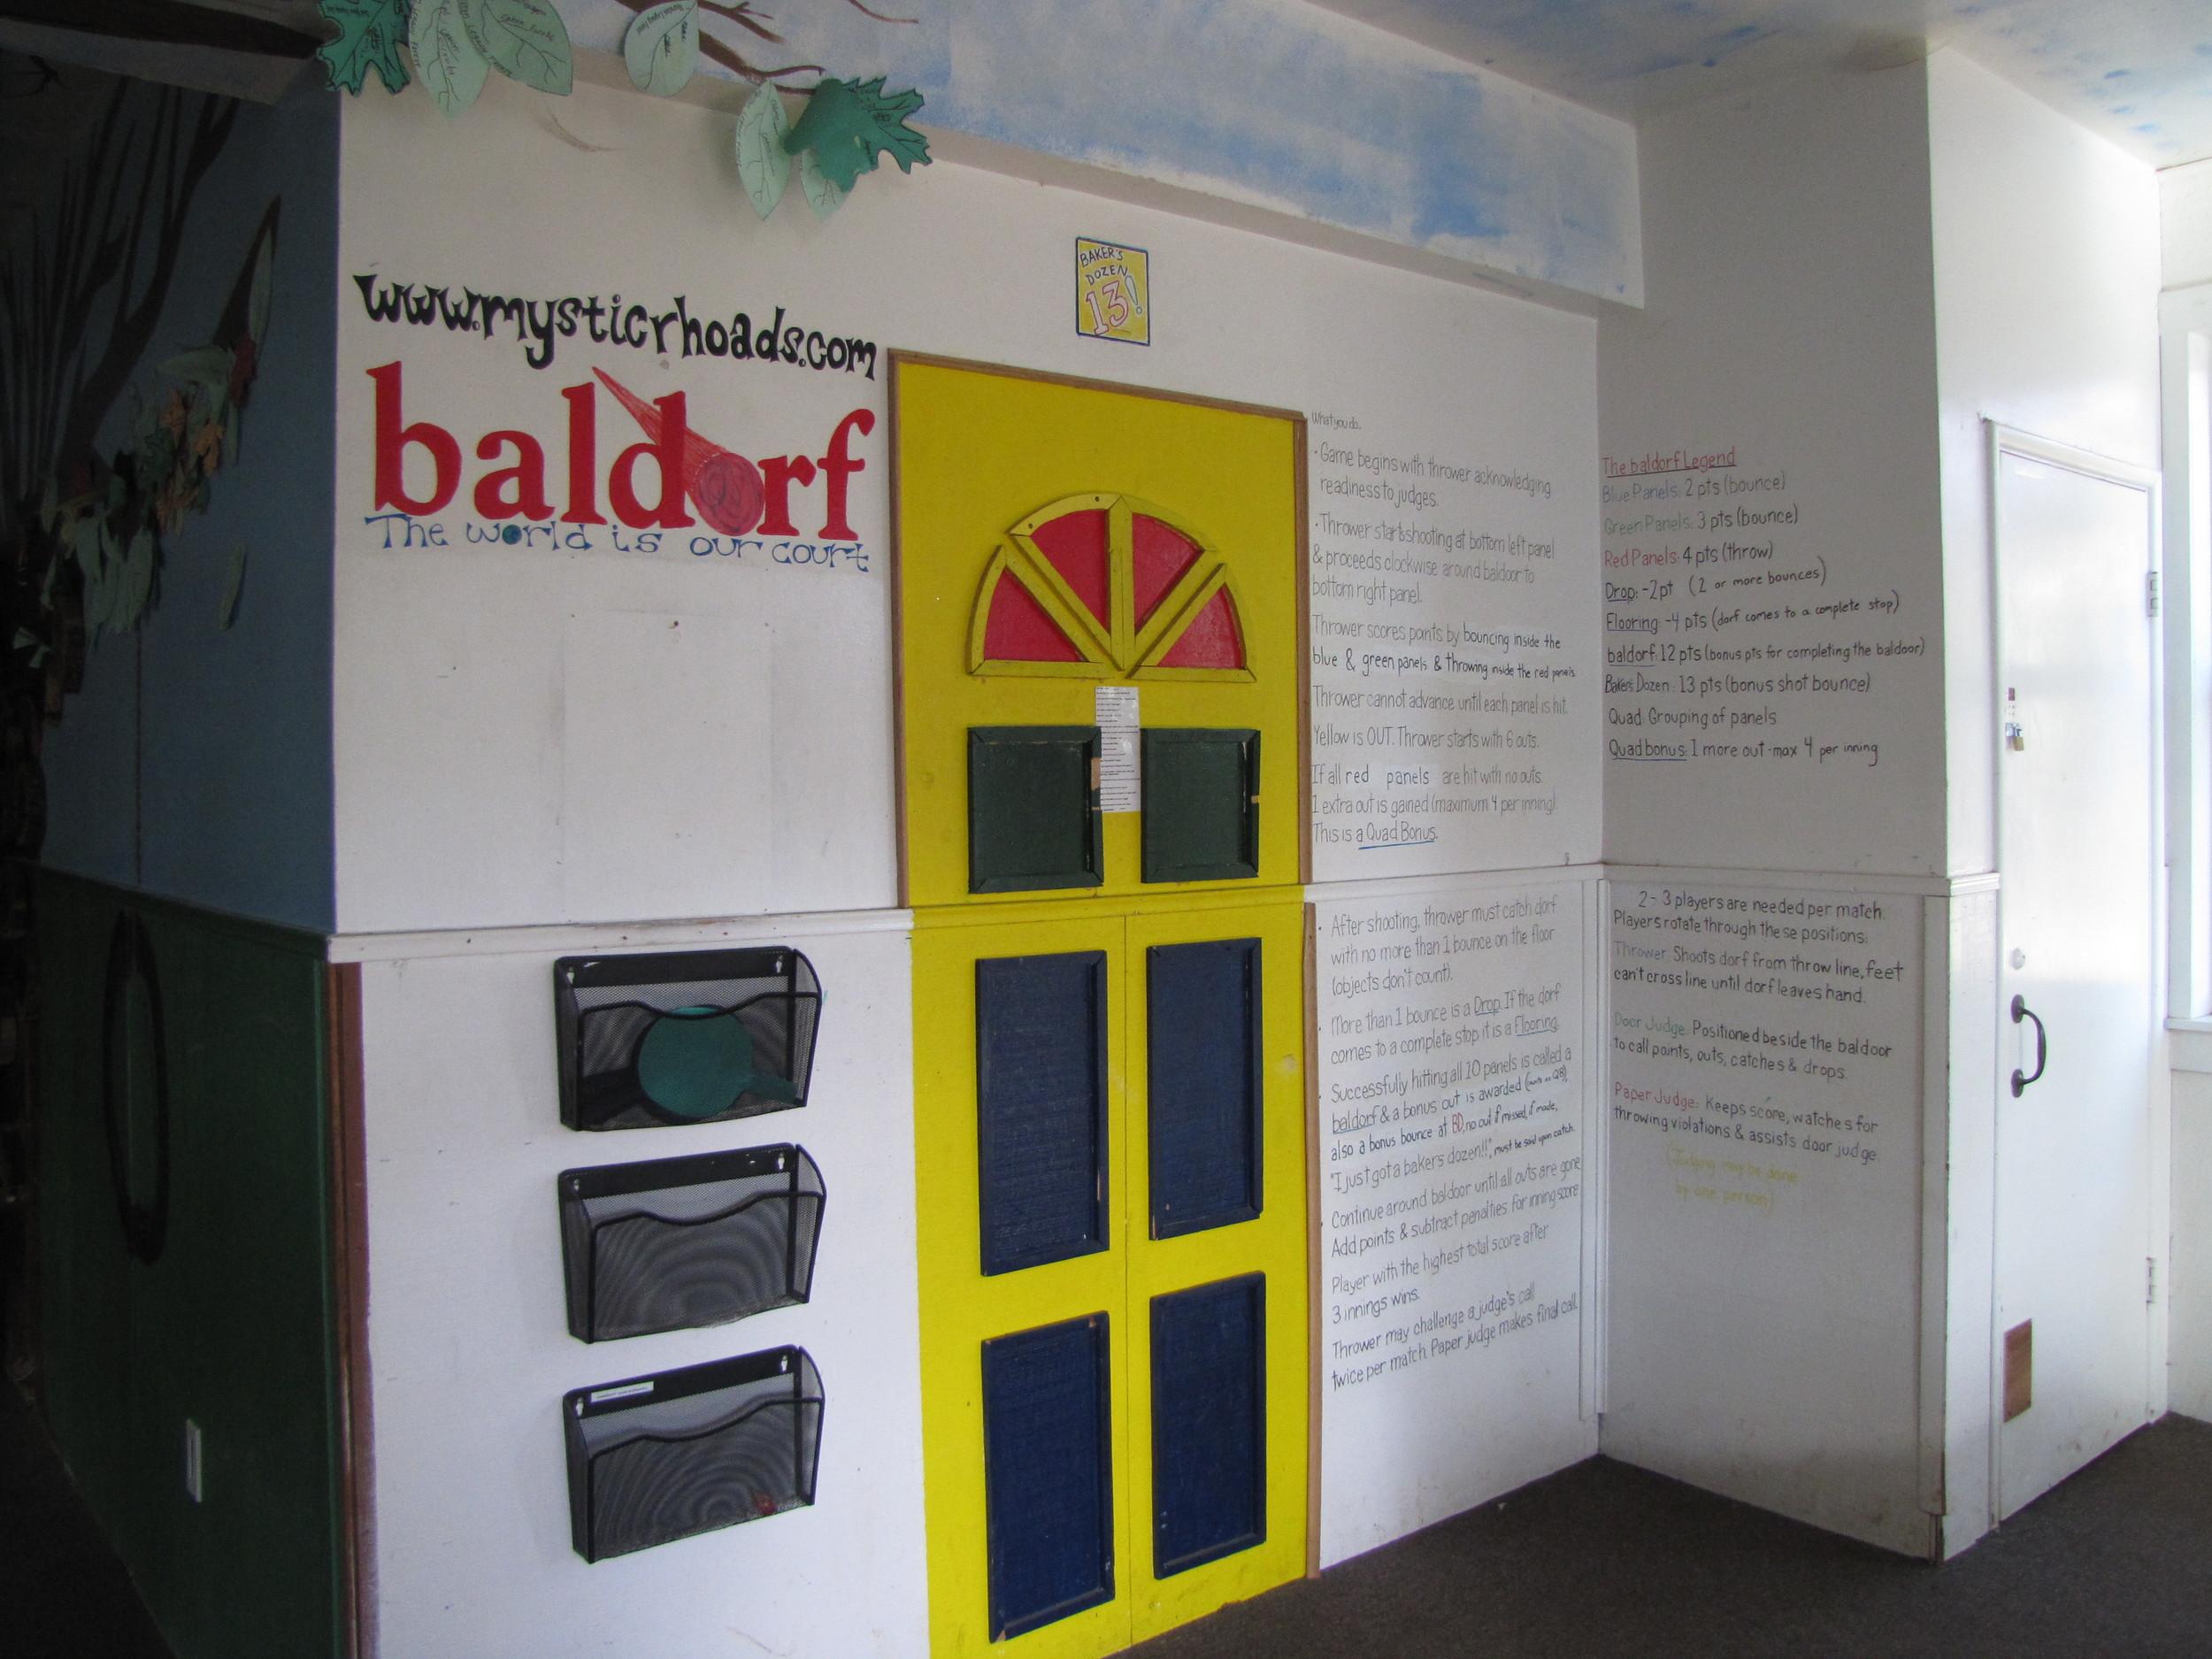 YMCA Camp Marston Baldorf